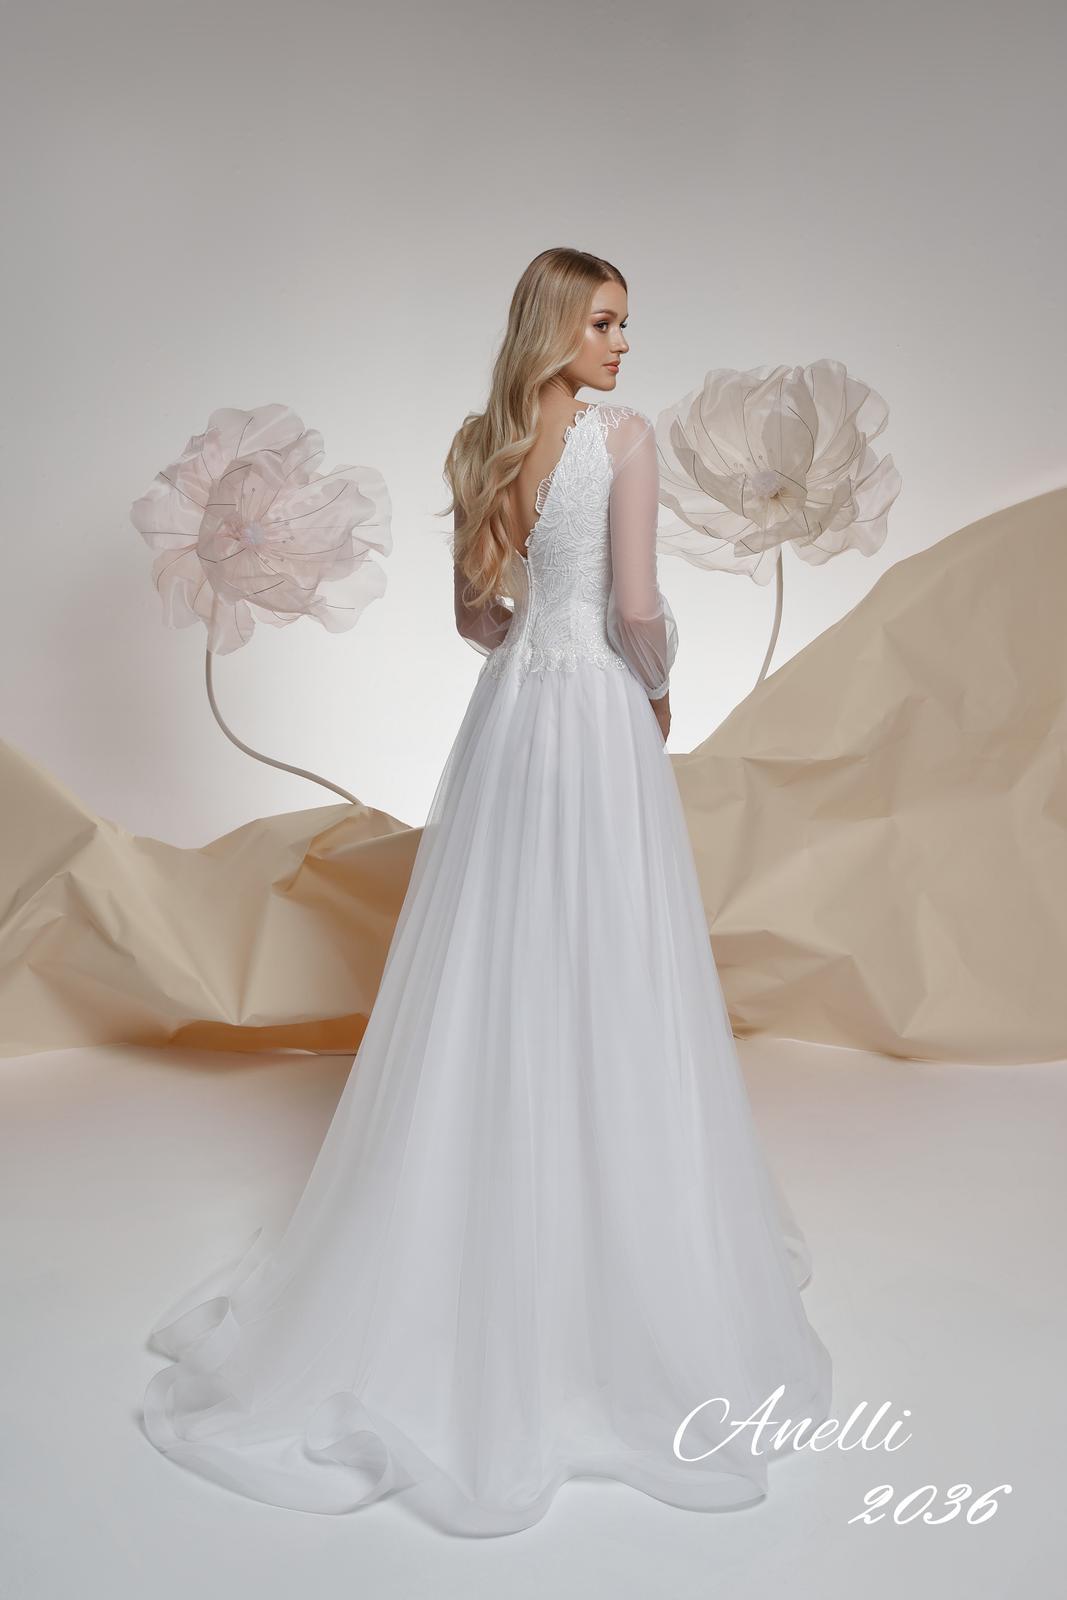 Svadobné šaty - Imagine 2036 - Obrázok č. 3